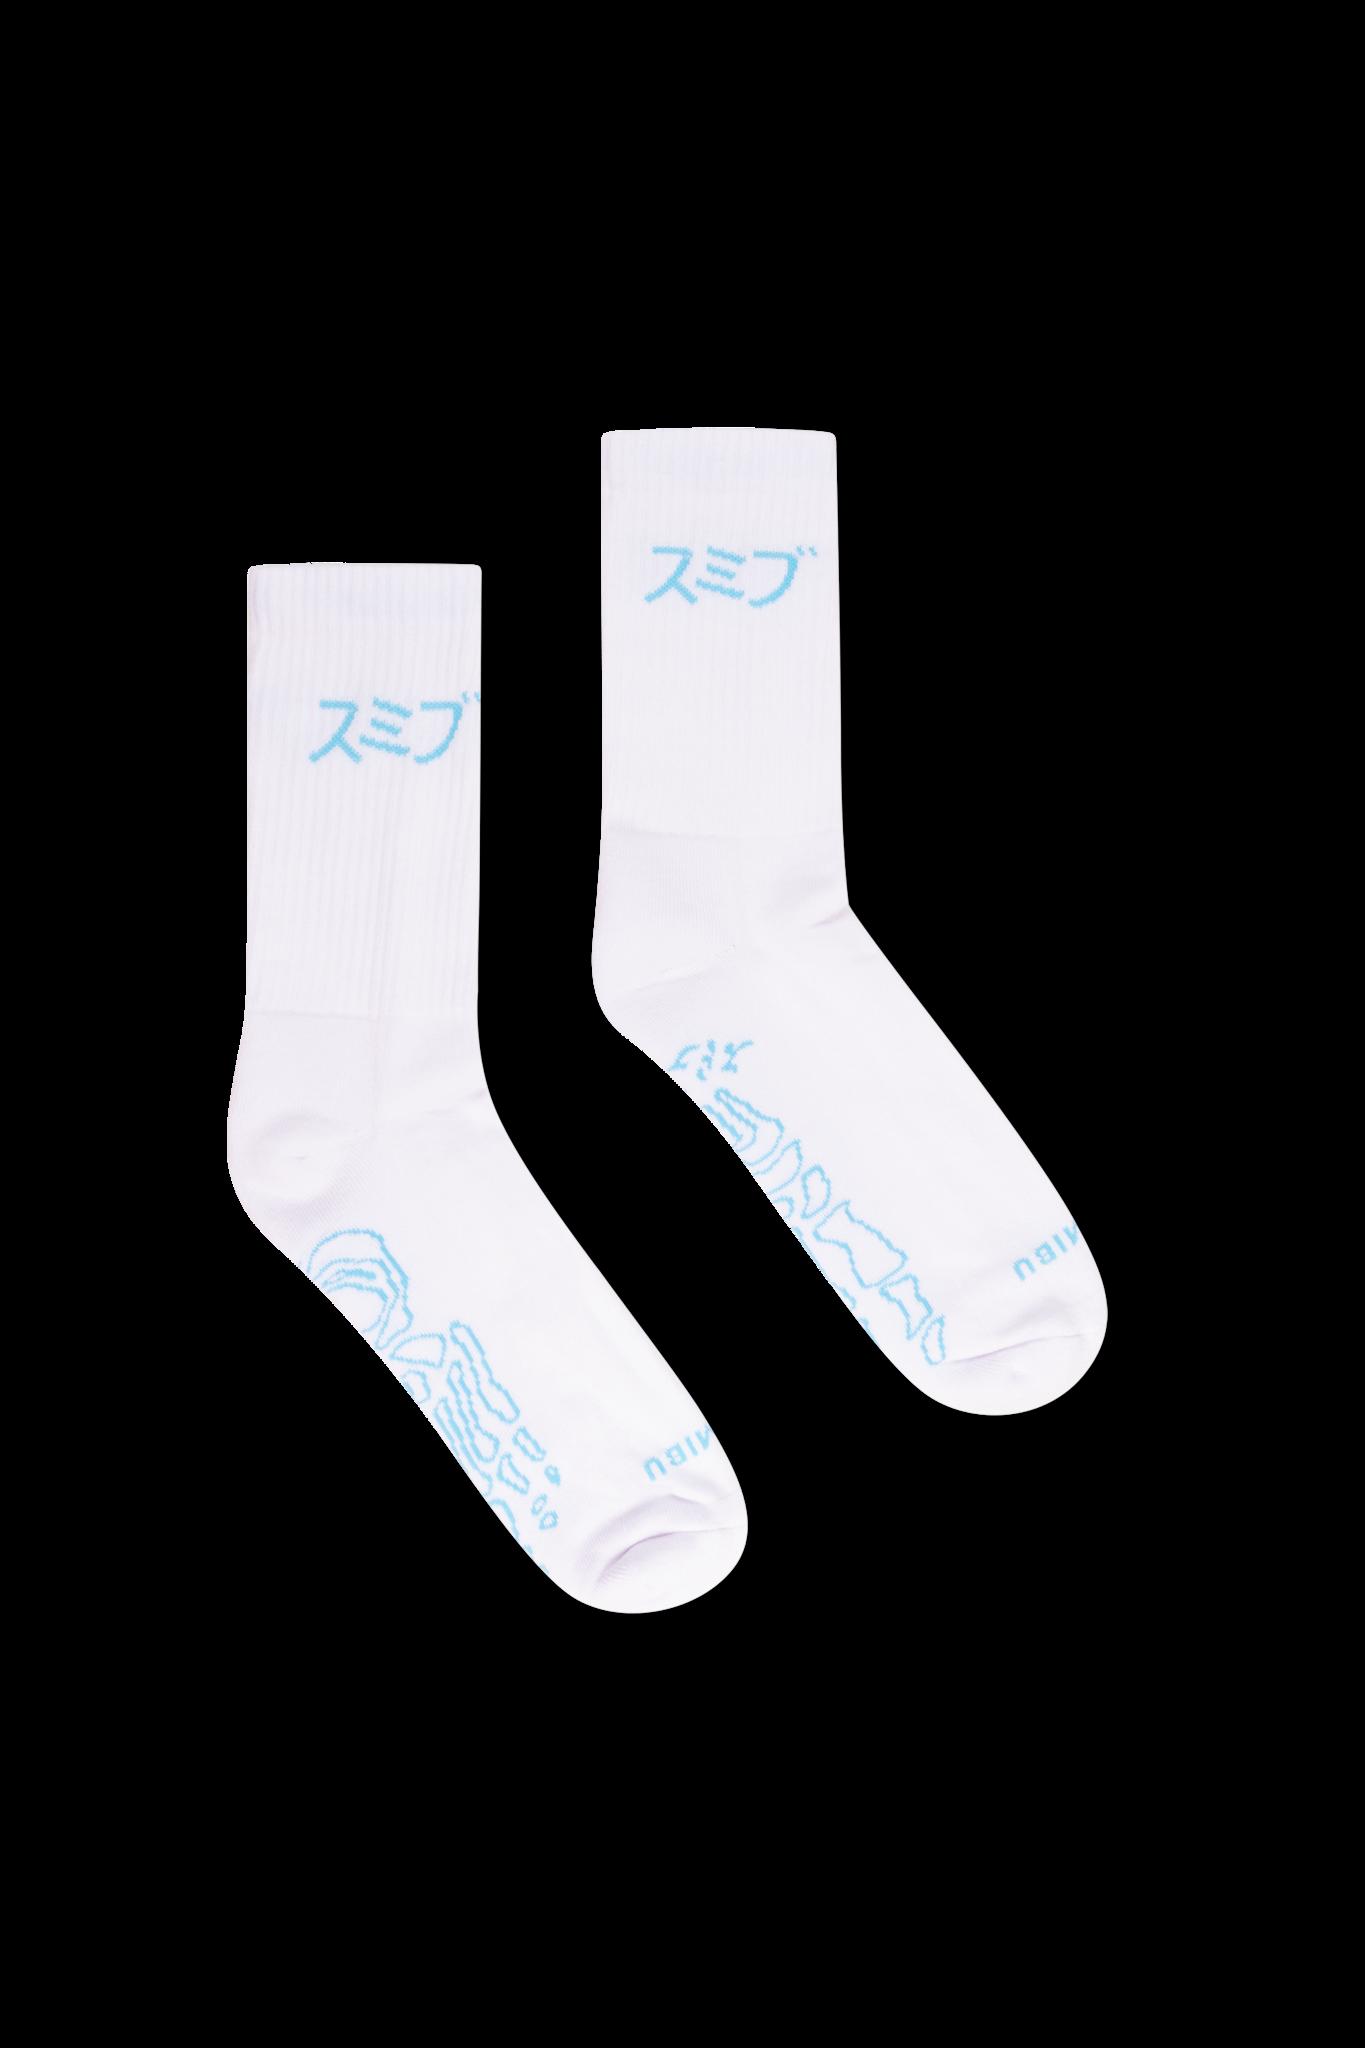 SUMIBU Skeleton Socks | White/Blue